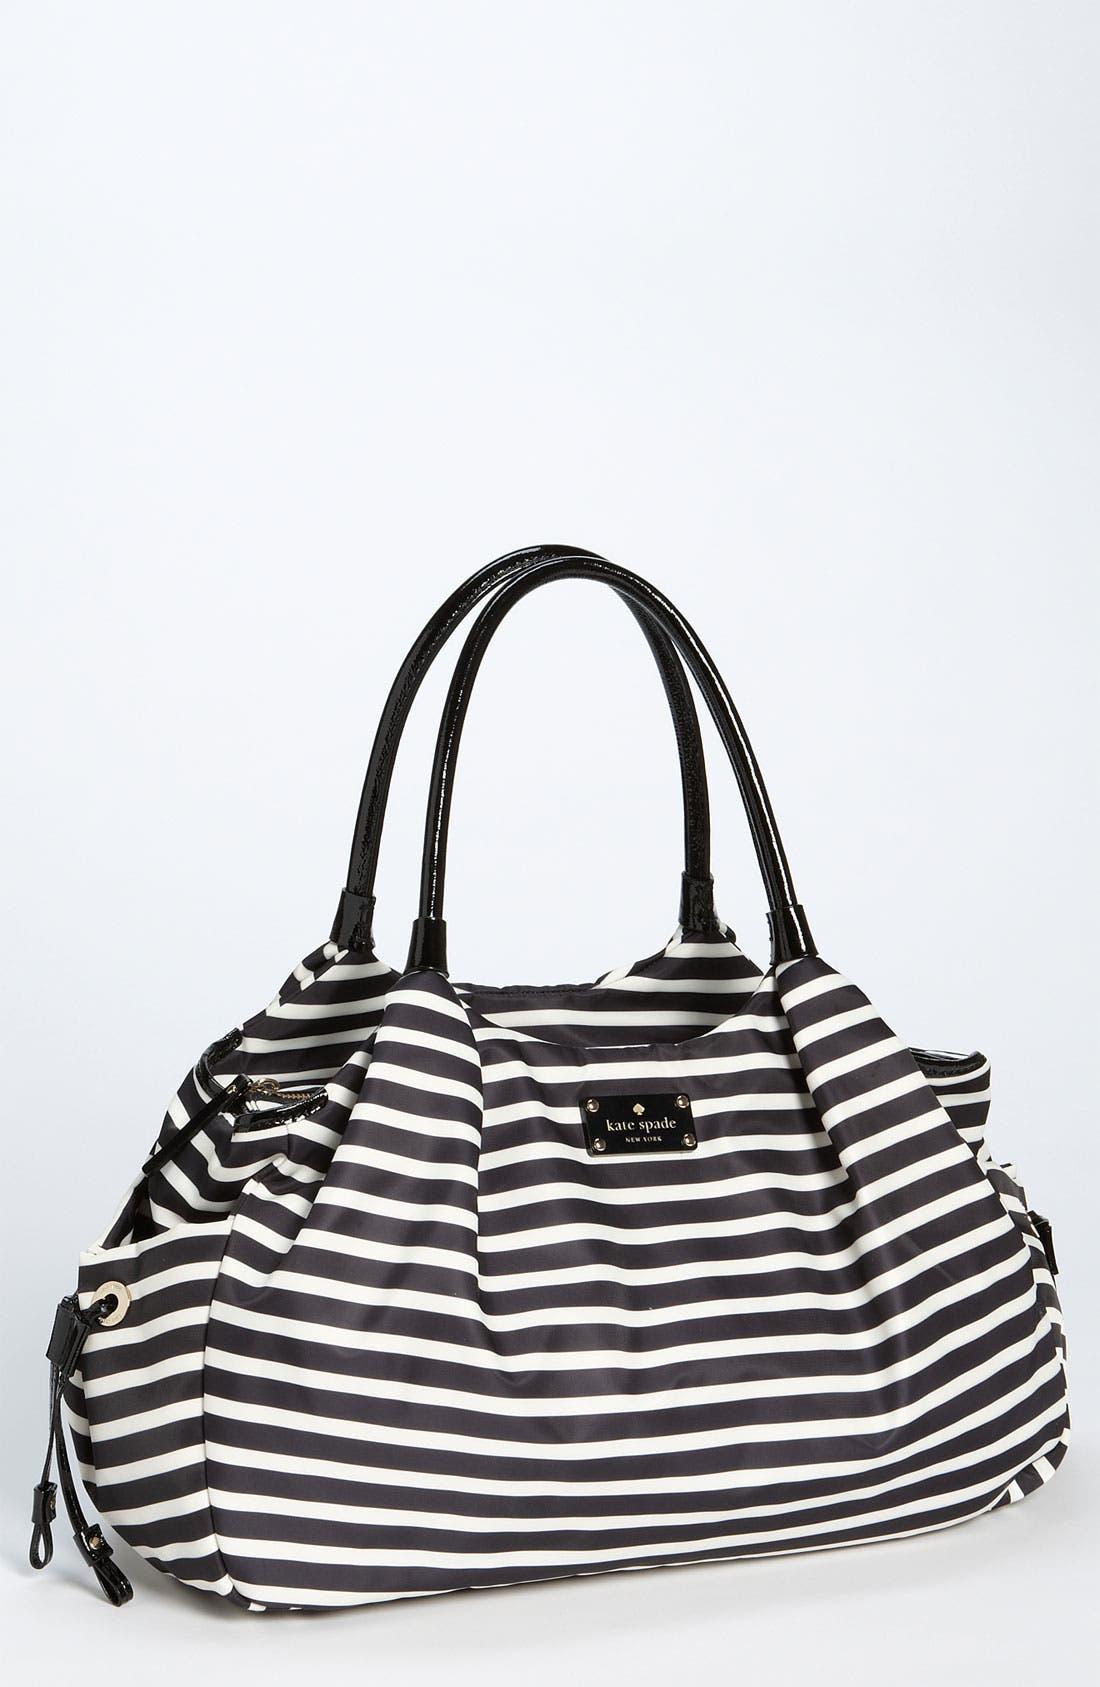 Main Image - kate spade new york 'stevie' baby bag